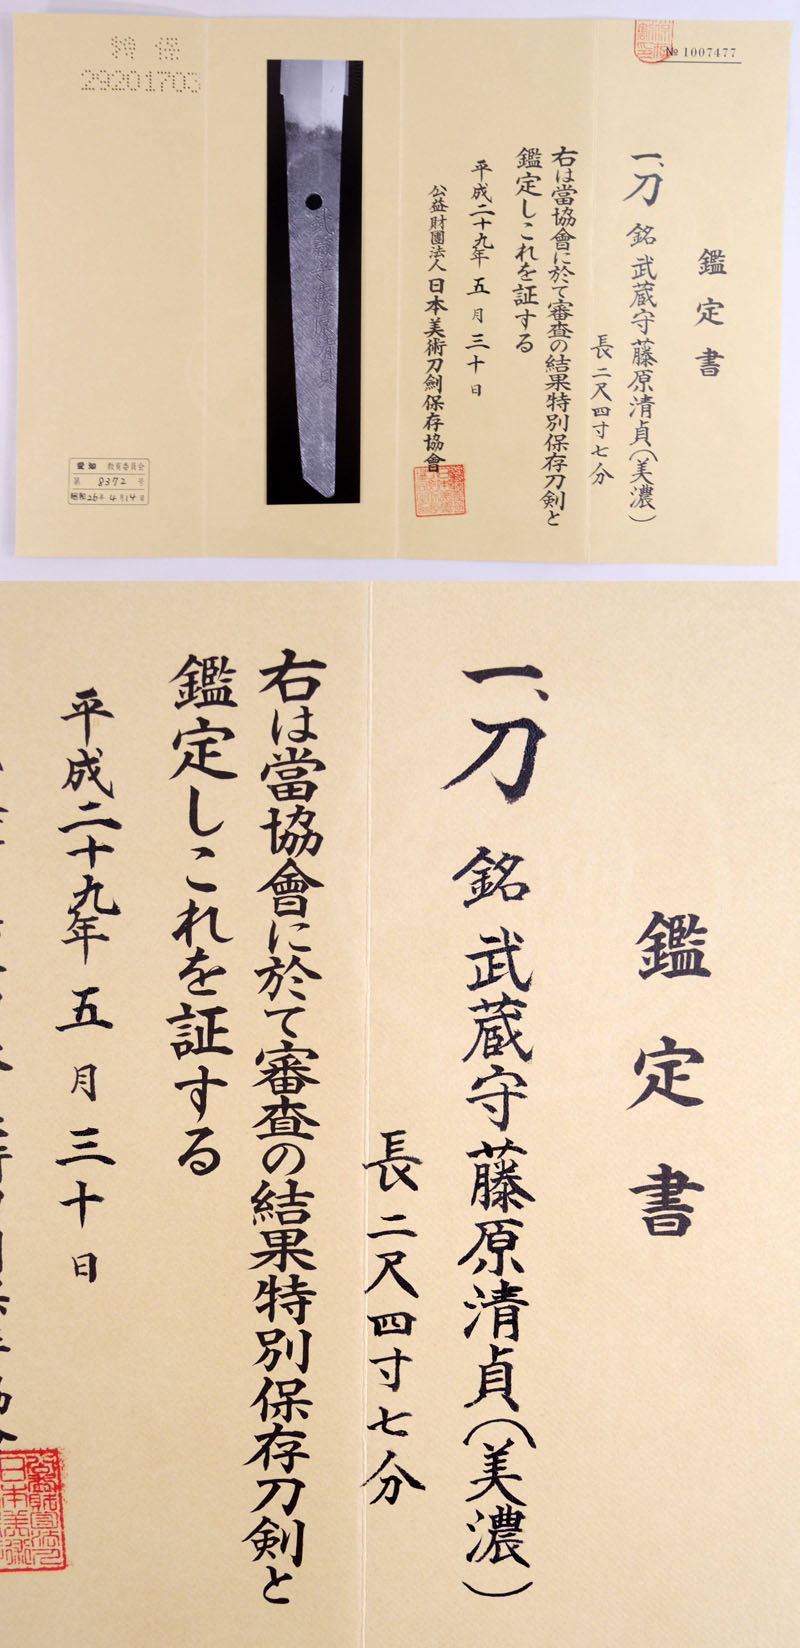 武蔵守藤原清貞(美濃) Picture of Certificate